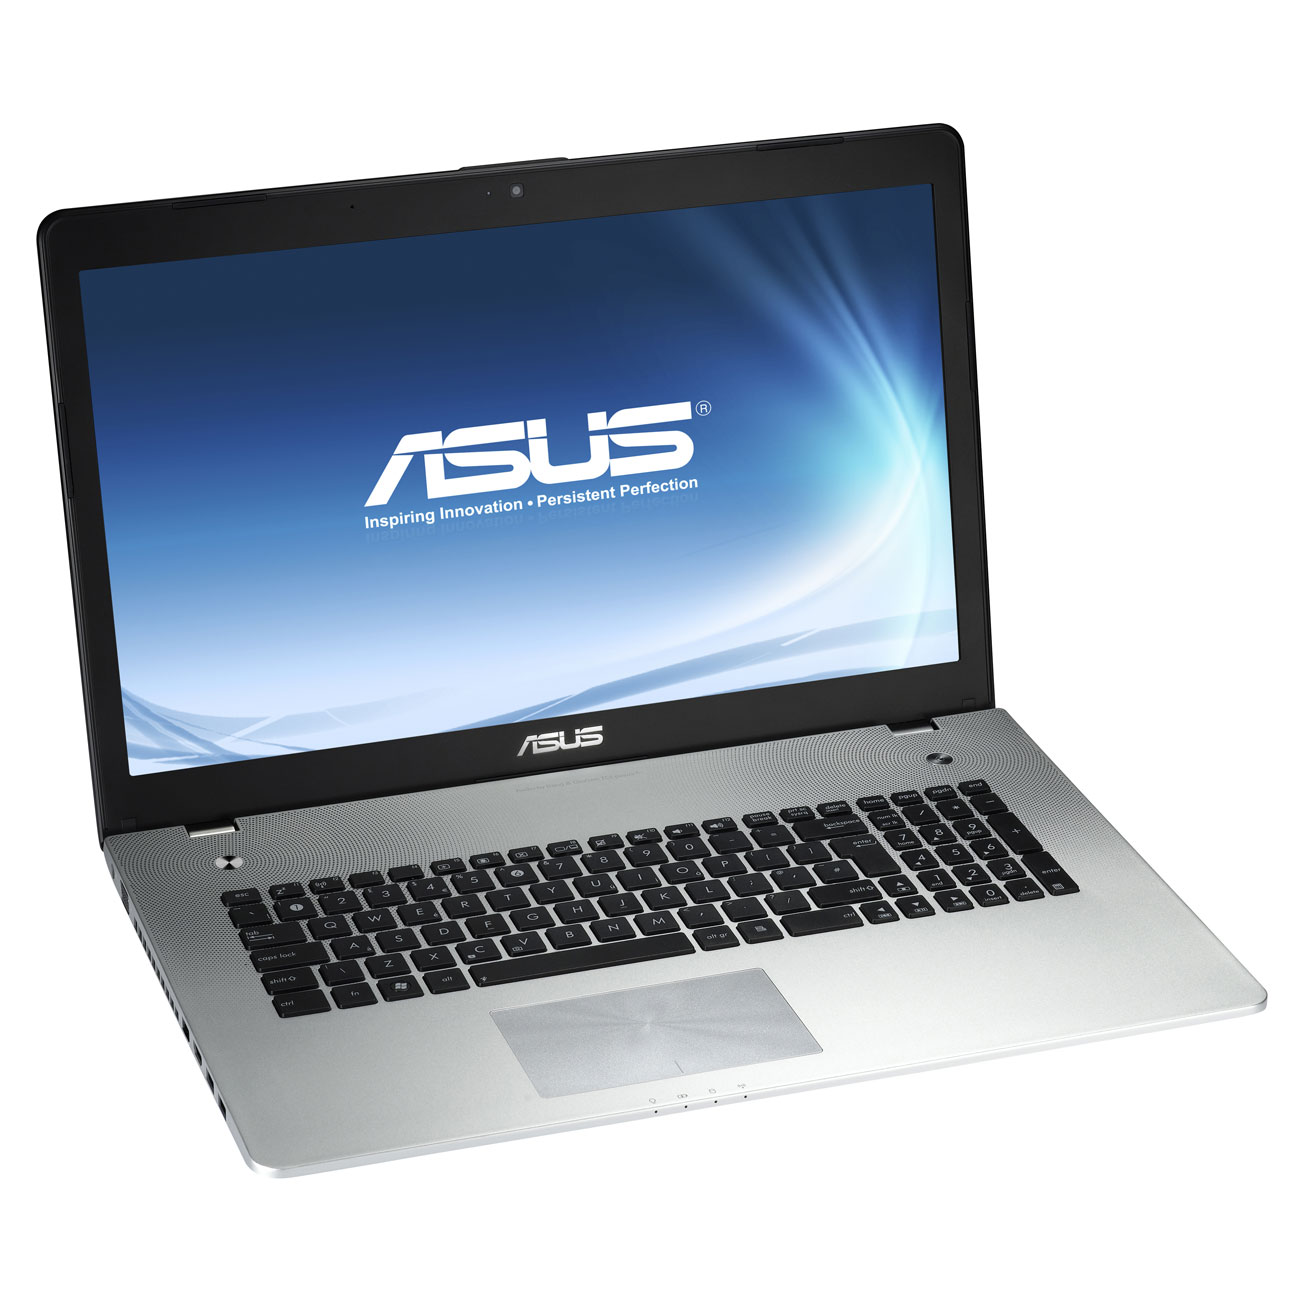 "PC portable ASUS N76VB-T4166H Intel Core i7-3630QM 6 Go 750 Go 17.3"" LED NVIDIA GeForce GT 740M Graveur DVD Wi-Fi N/Bluetooth Webcam Windows 8 64 bits (garantie constructeur 1 an)"